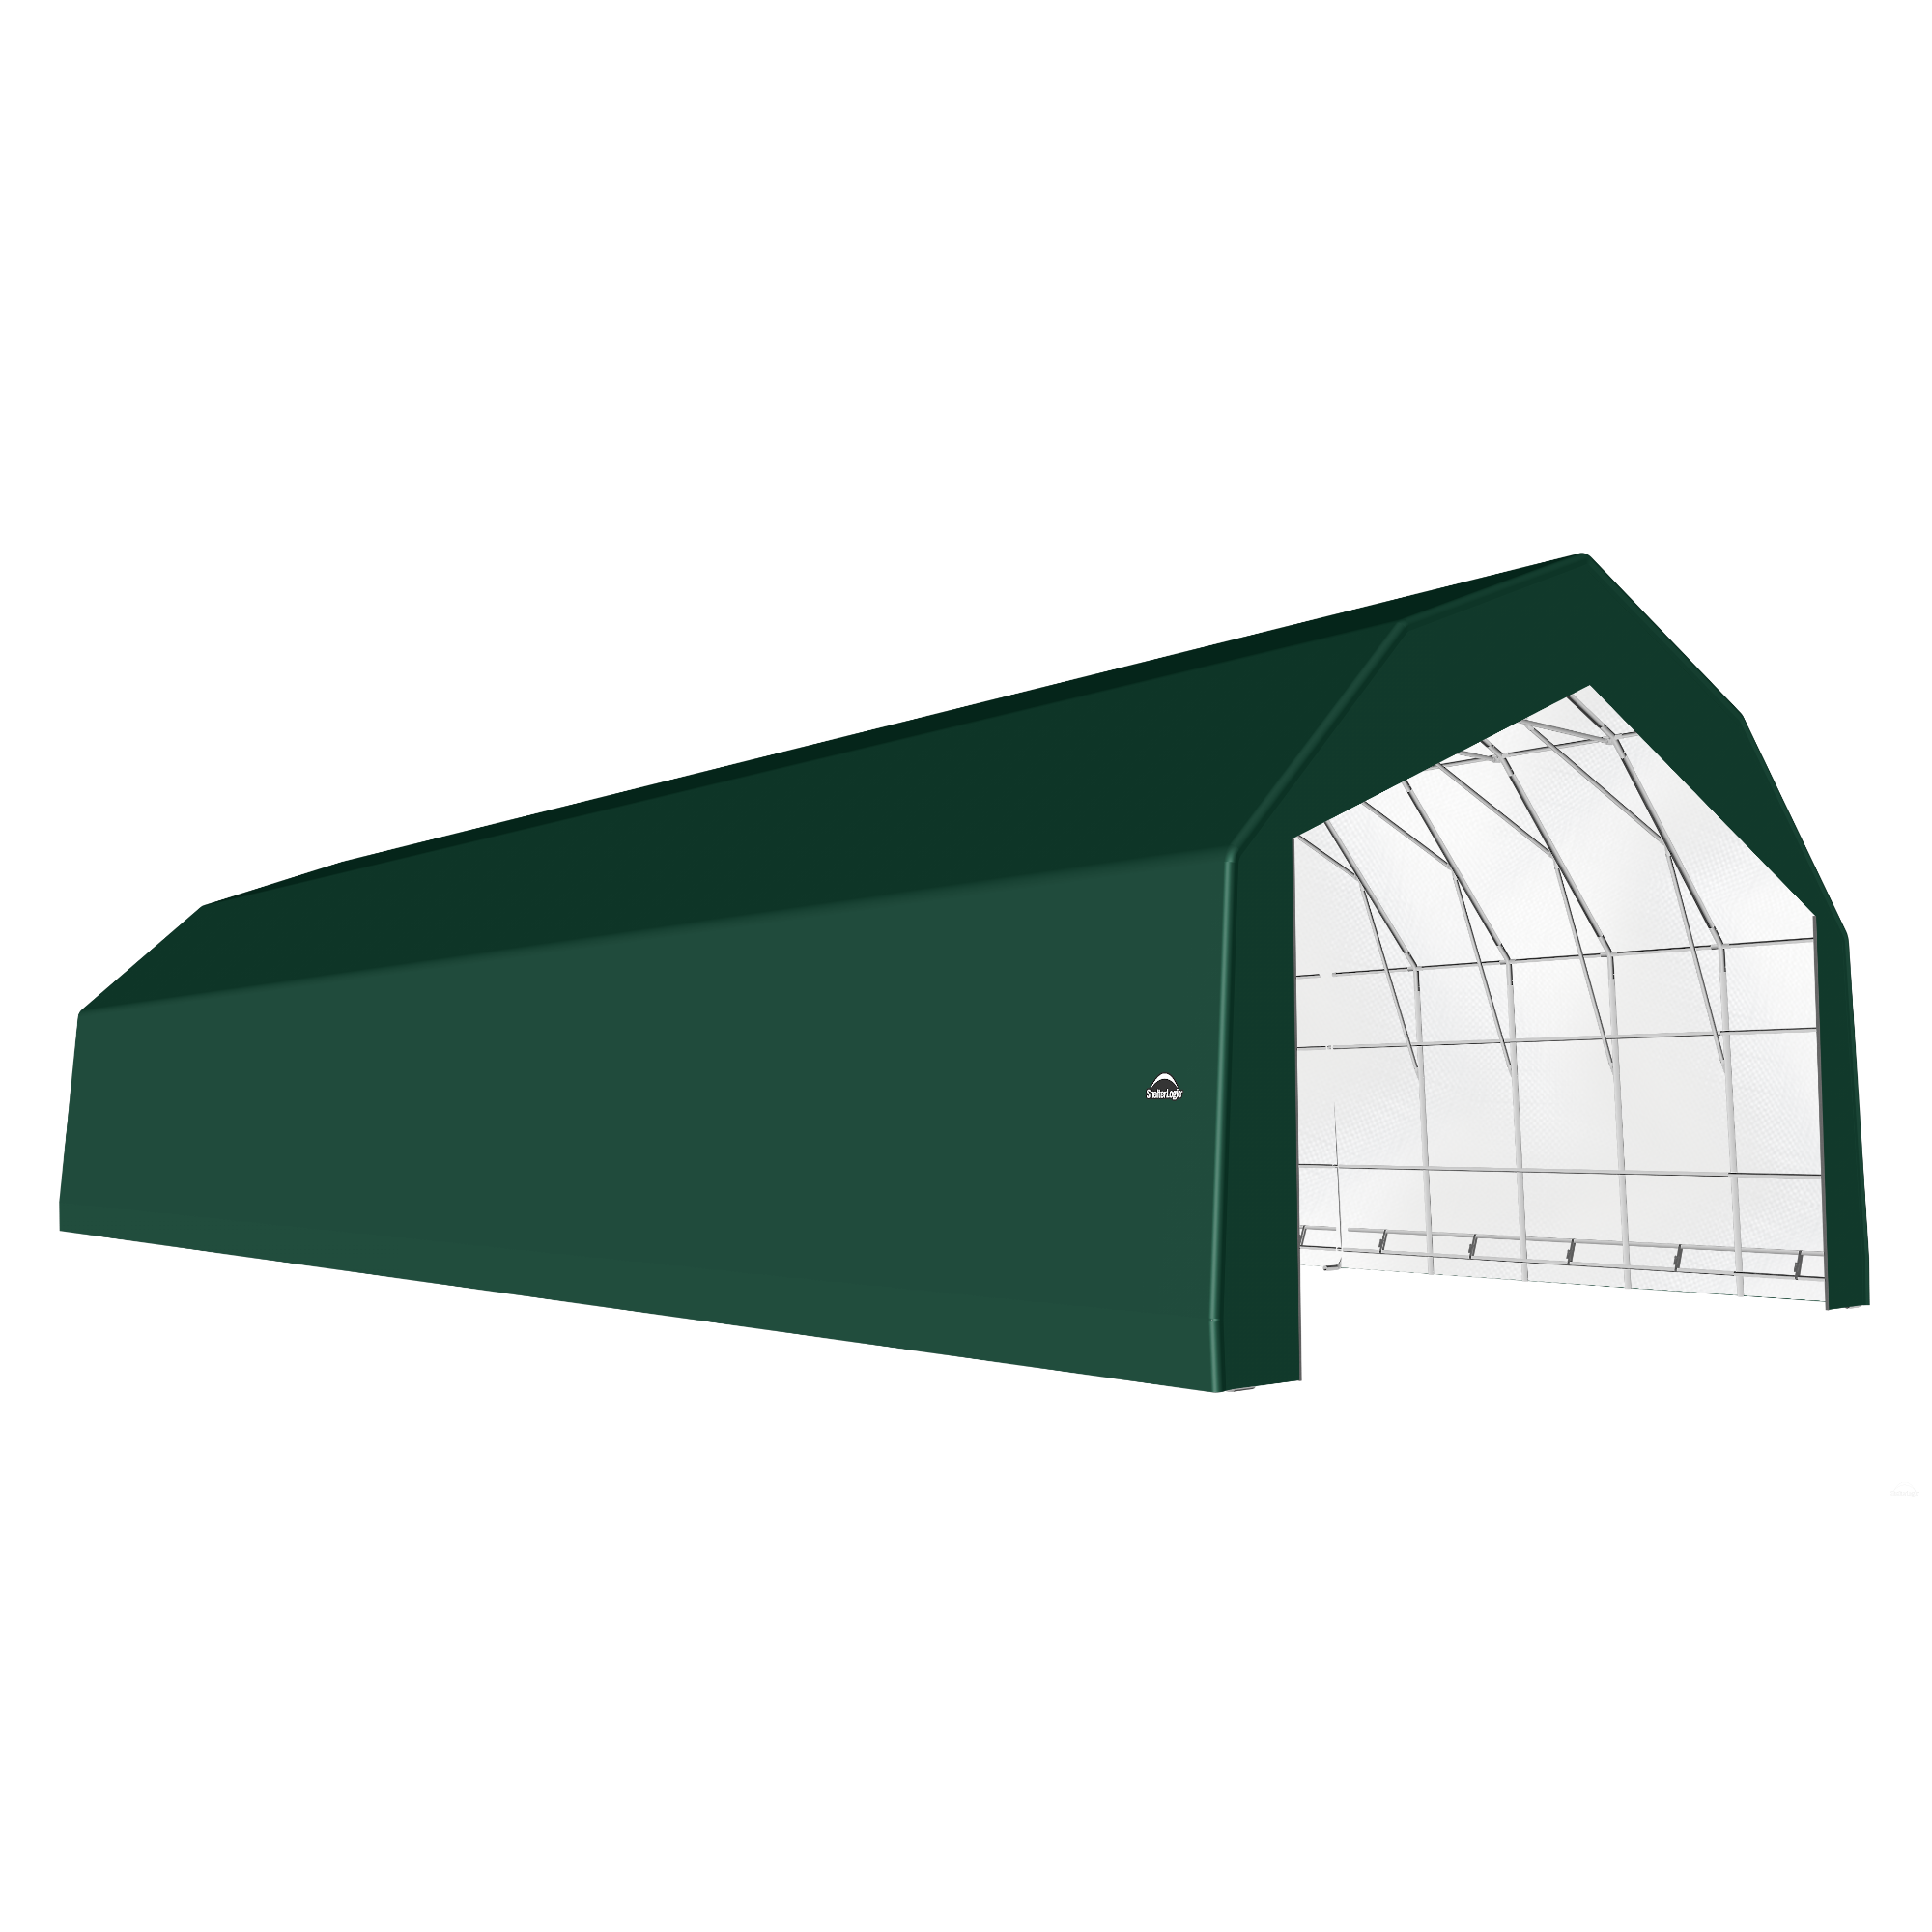 SP Barn 30X72X21 Green 14 oz PE Shelter